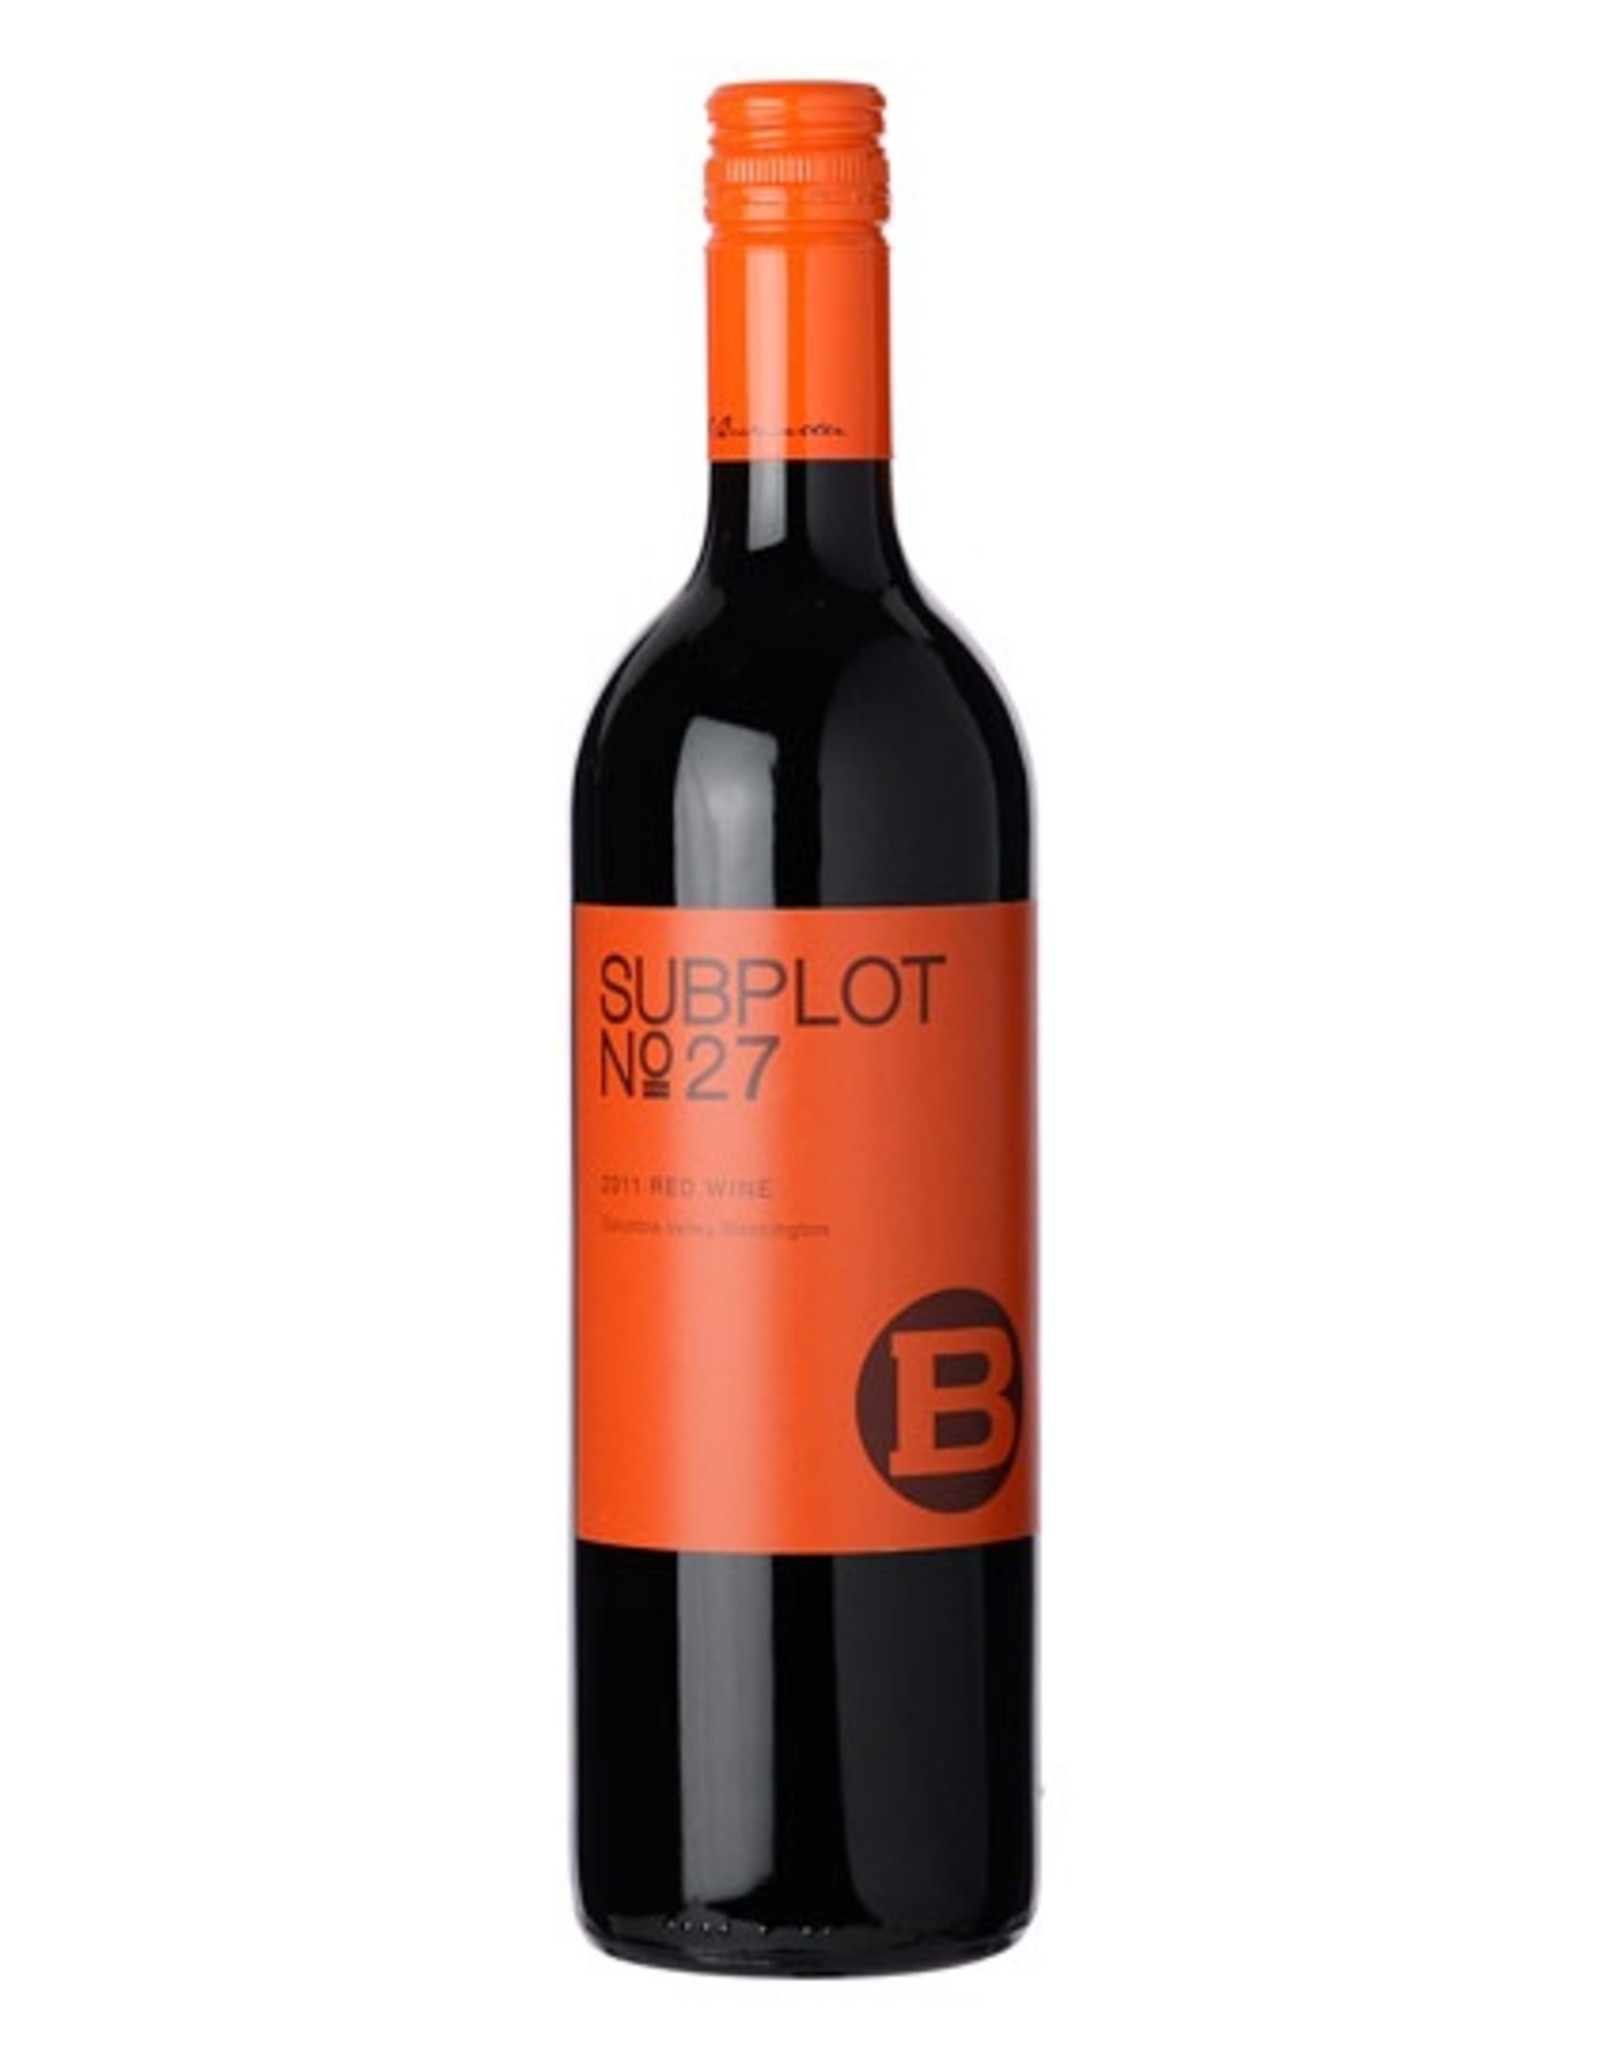 Red Wine 2011,Subplot No 27,Red Blend,Washington,UAS,Alc 14.2%